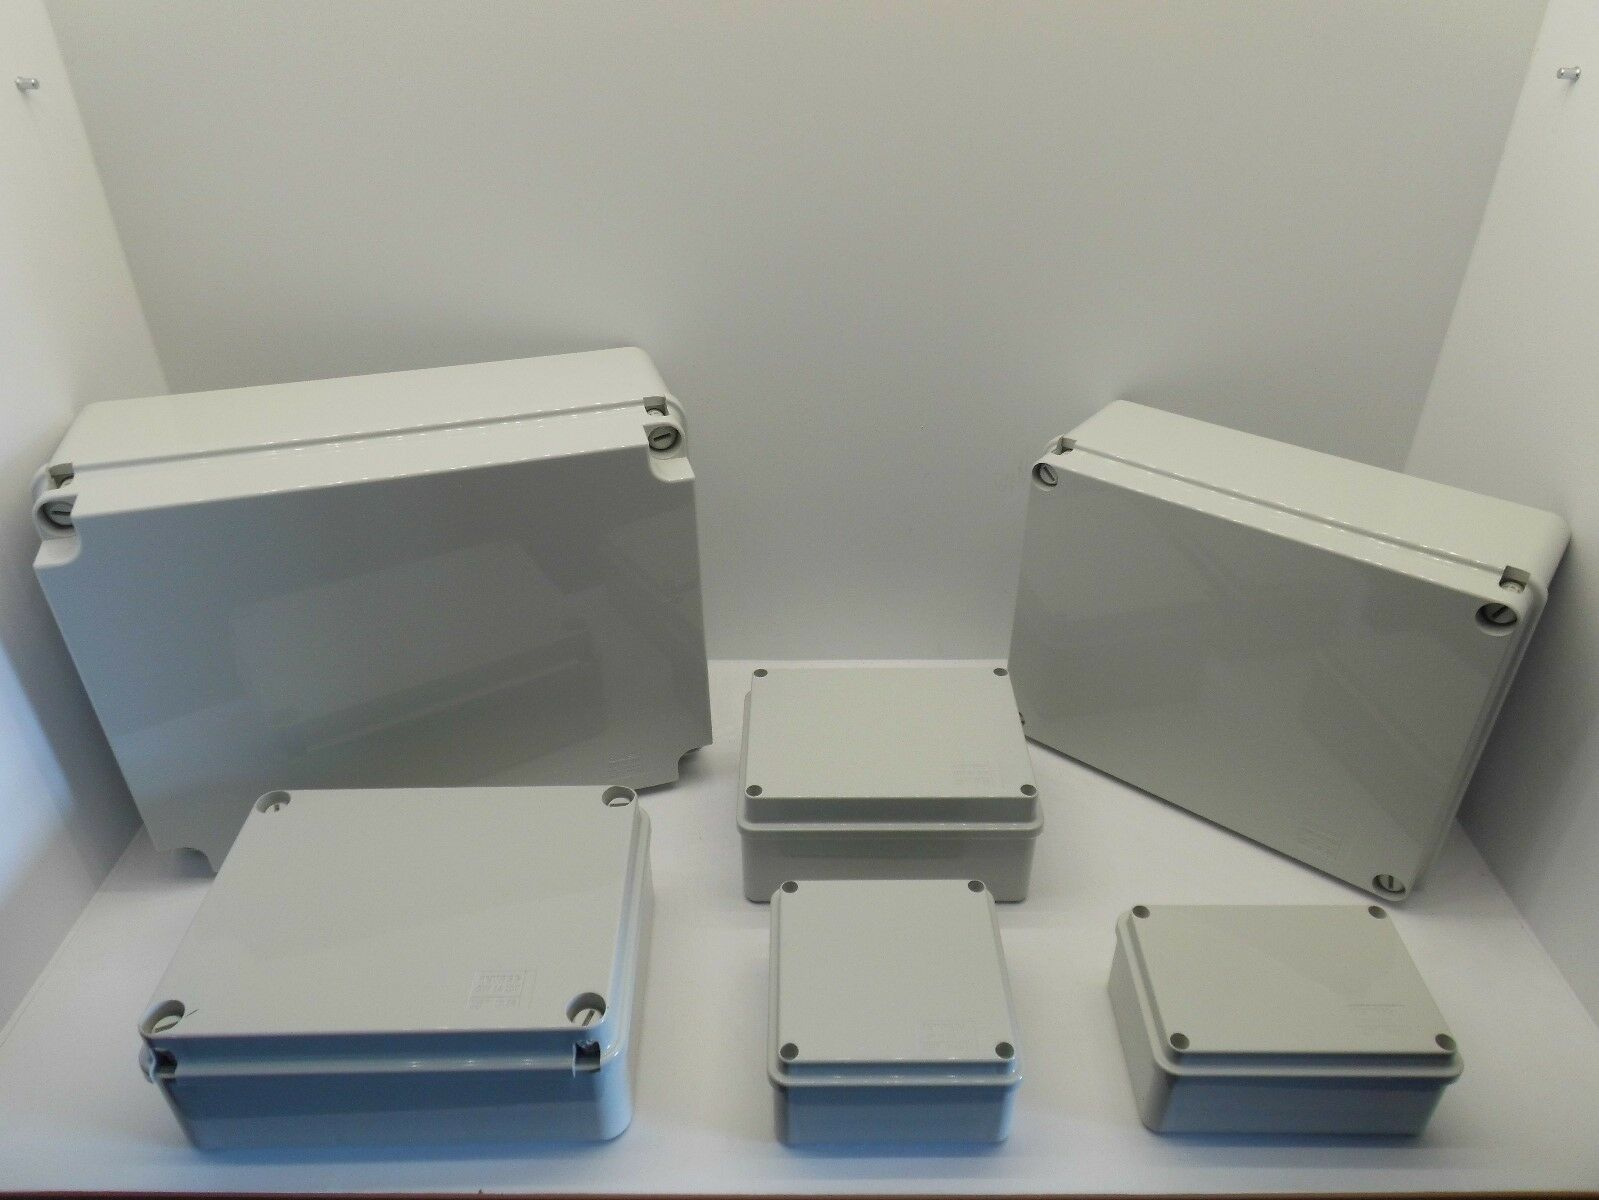 Grey Gewiss Junction Box Plastic IP44 Waterproof Outdoor Enclosure Box